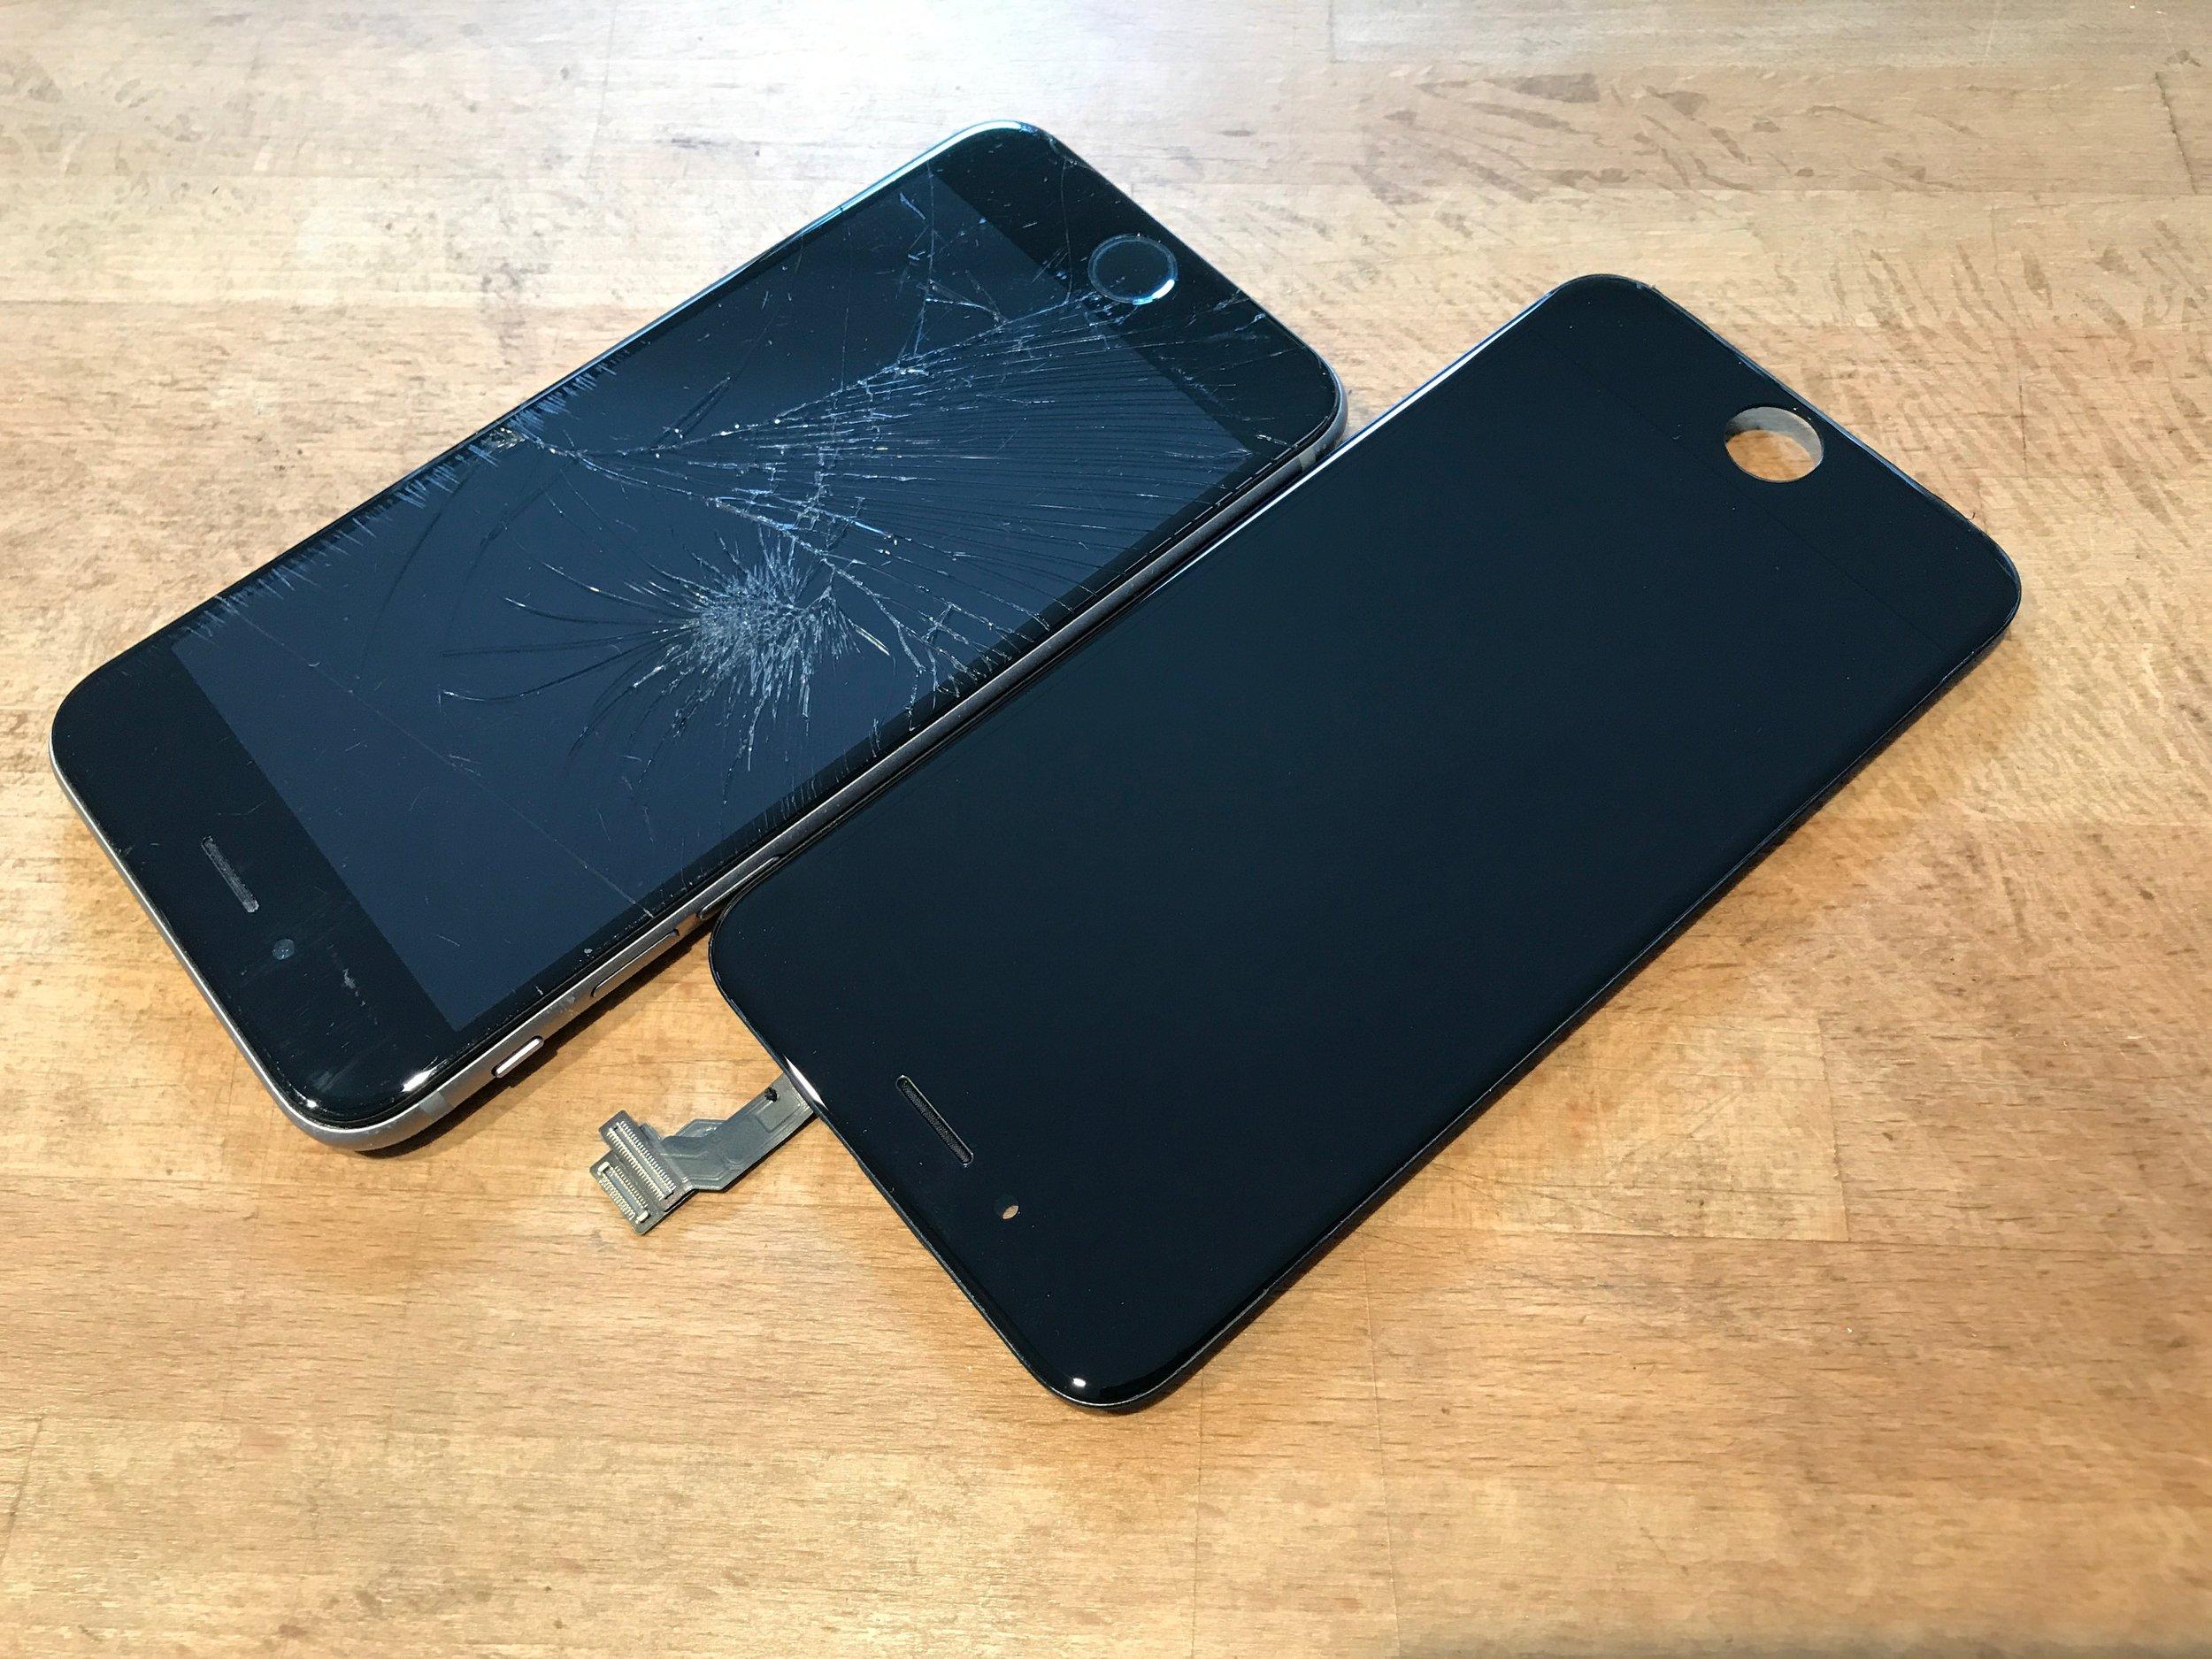 hot sales c5af9 dbf64 How to spot a spot a fake iPhone screen vs original quality — San ...